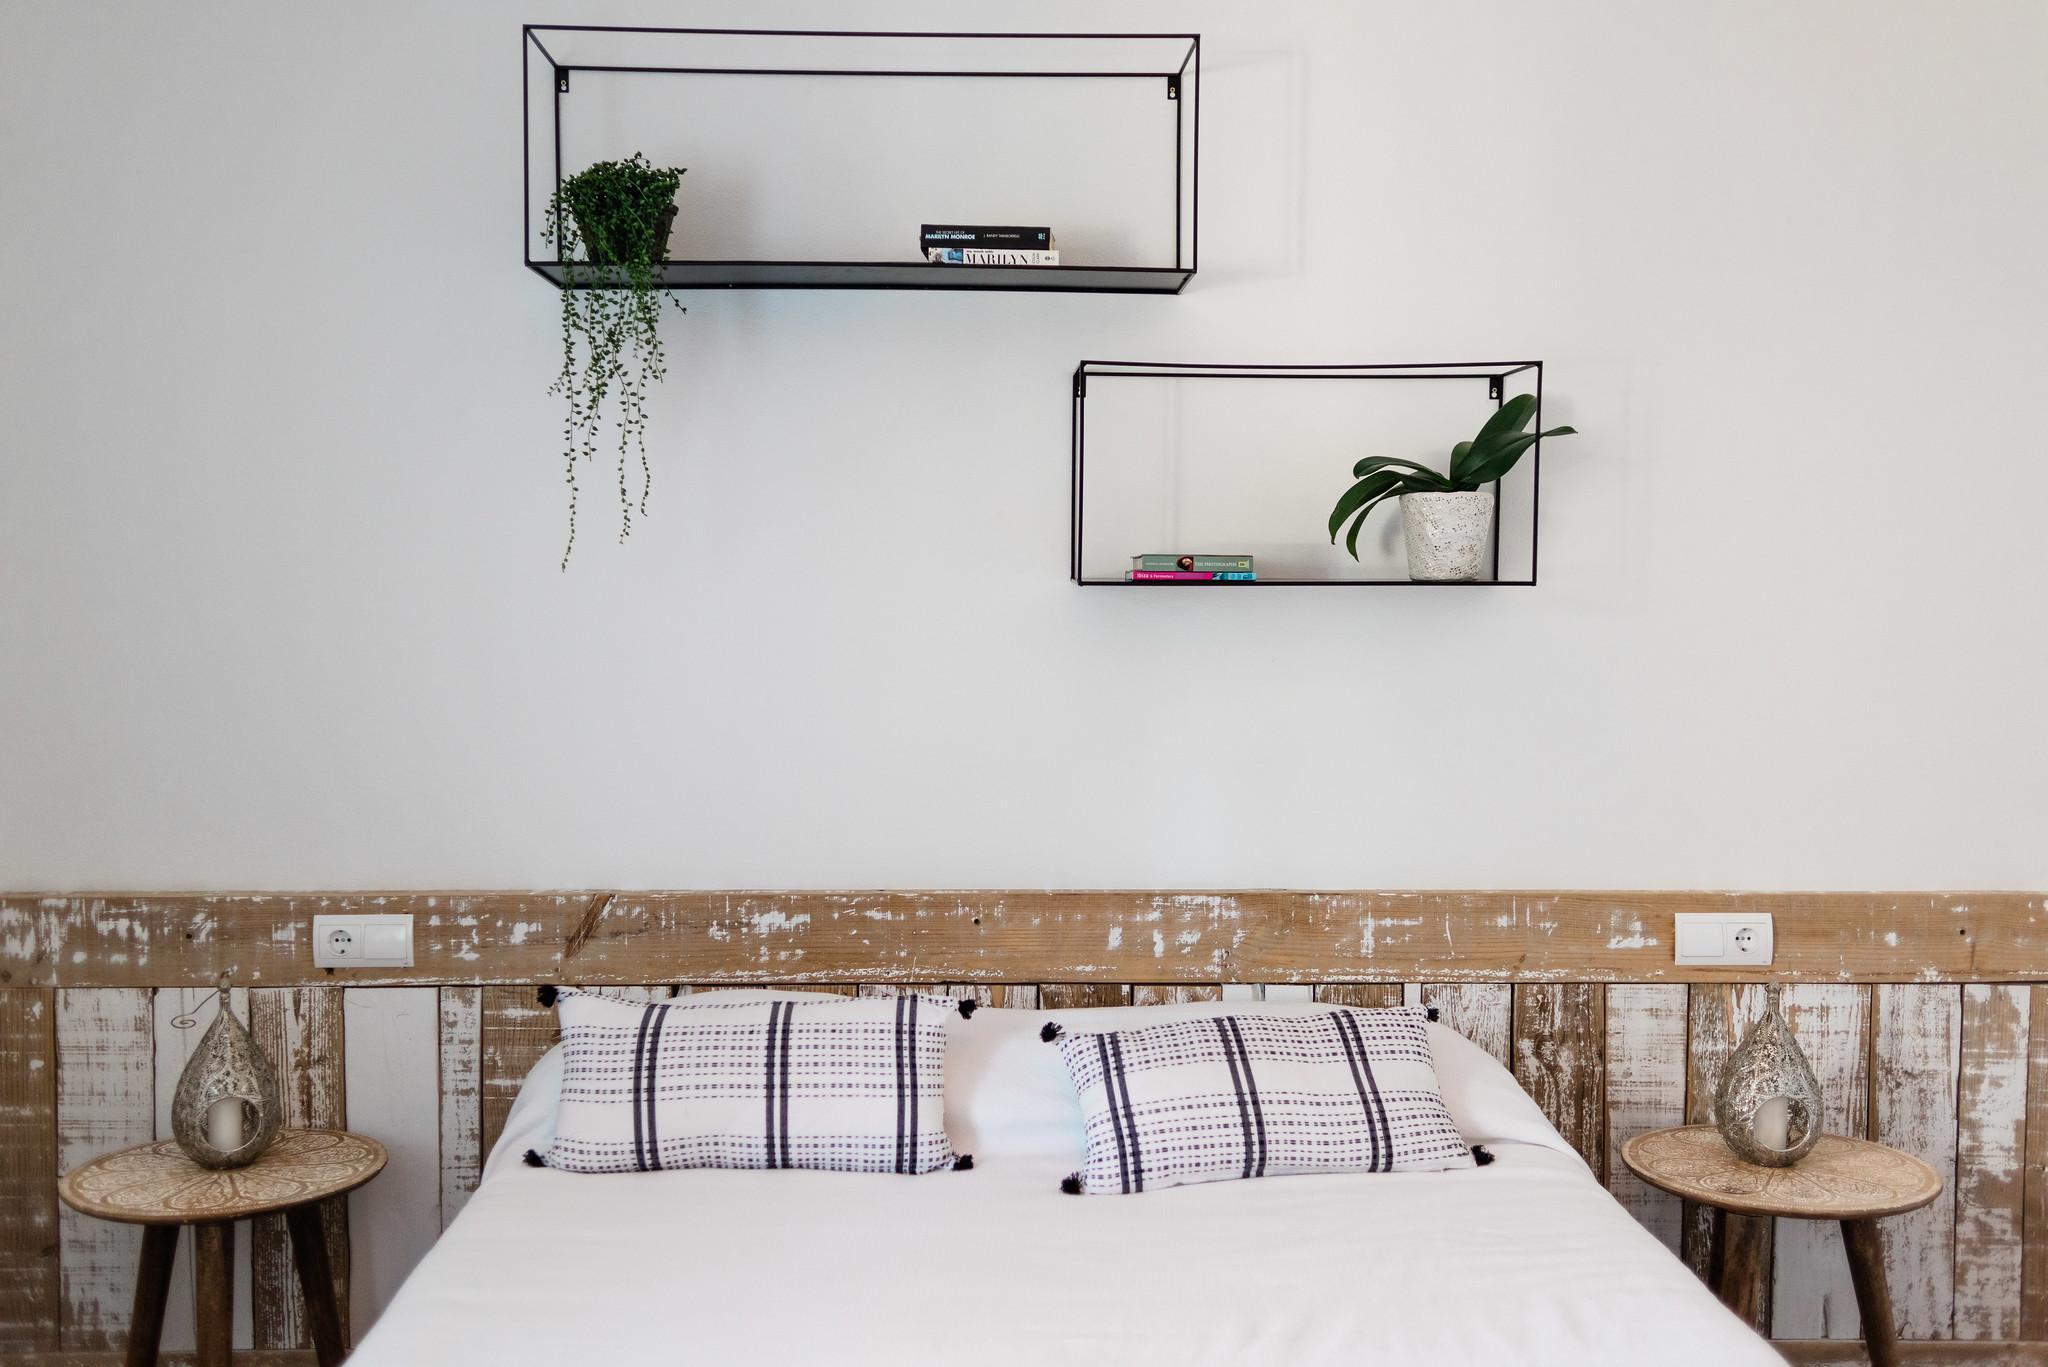 https://www.white-ibiza.com/wp-content/uploads/2020/05/white-ibiza-villas-can-verde-interior-bedroom4.jpg